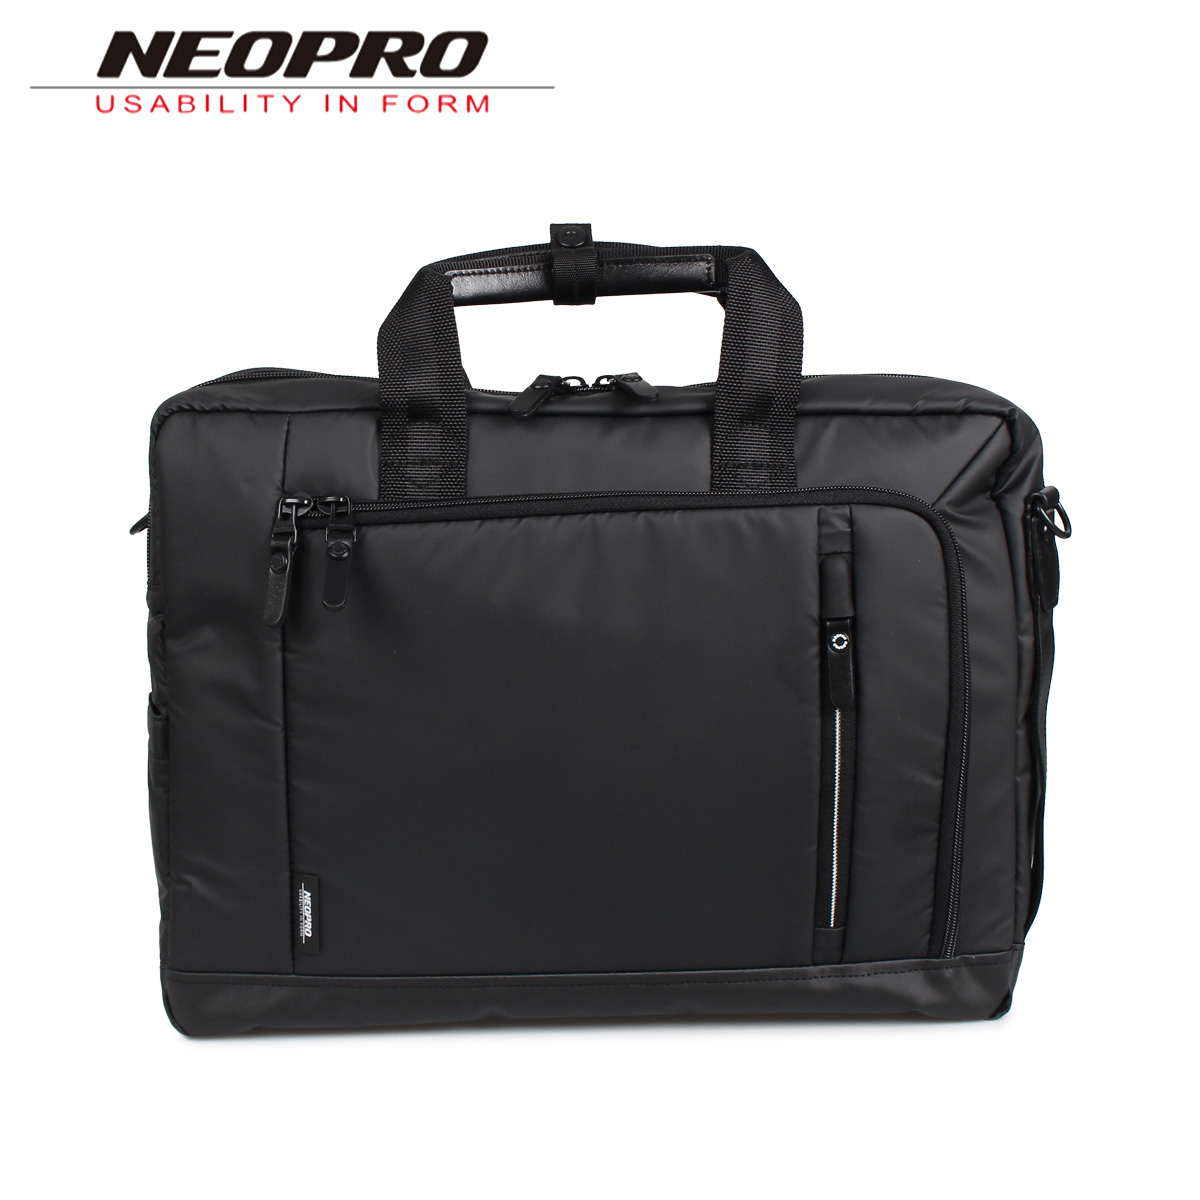 NEOPRO ネオプロ リュック バック バックパック ビジネスバッグ ショルダー メンズ 3WAY RED ブラック 黒 2-761